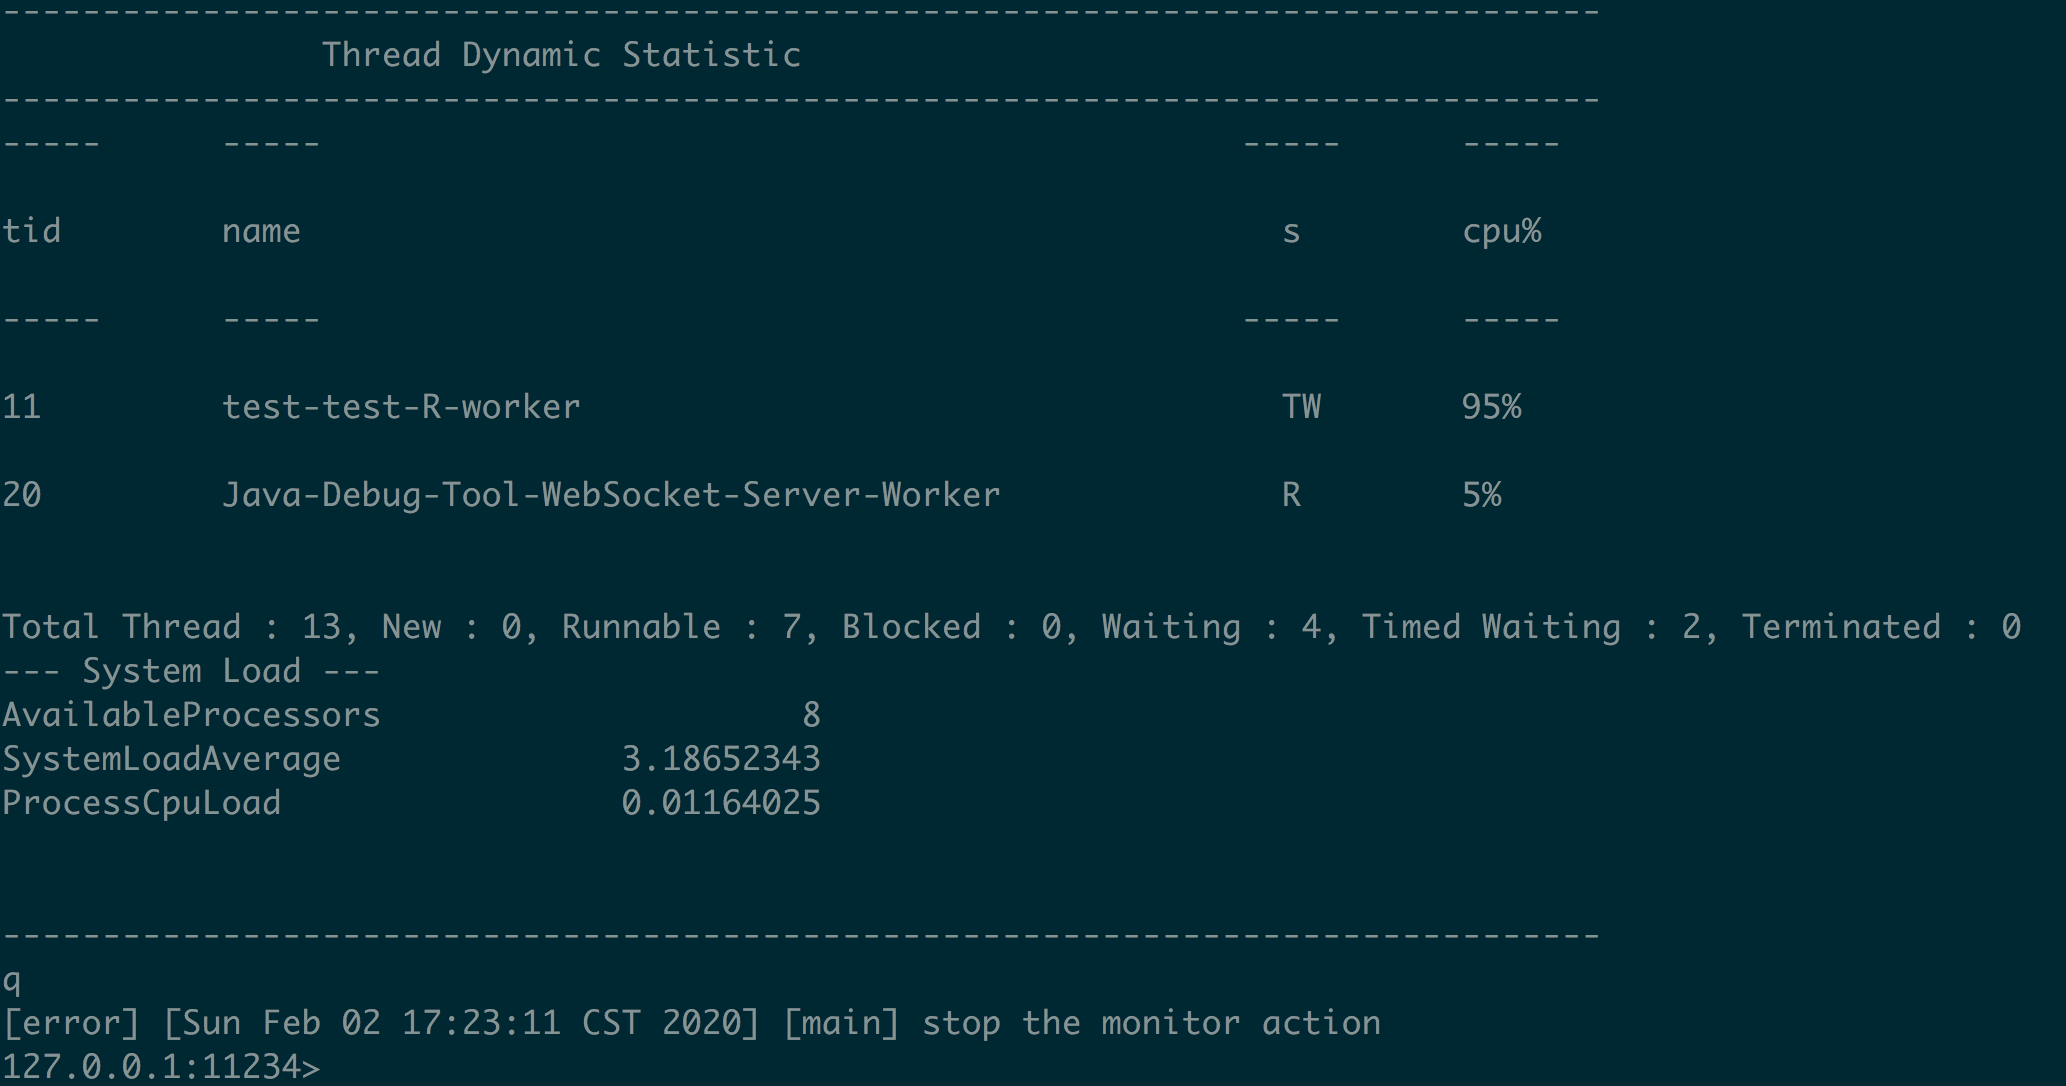 monitor command